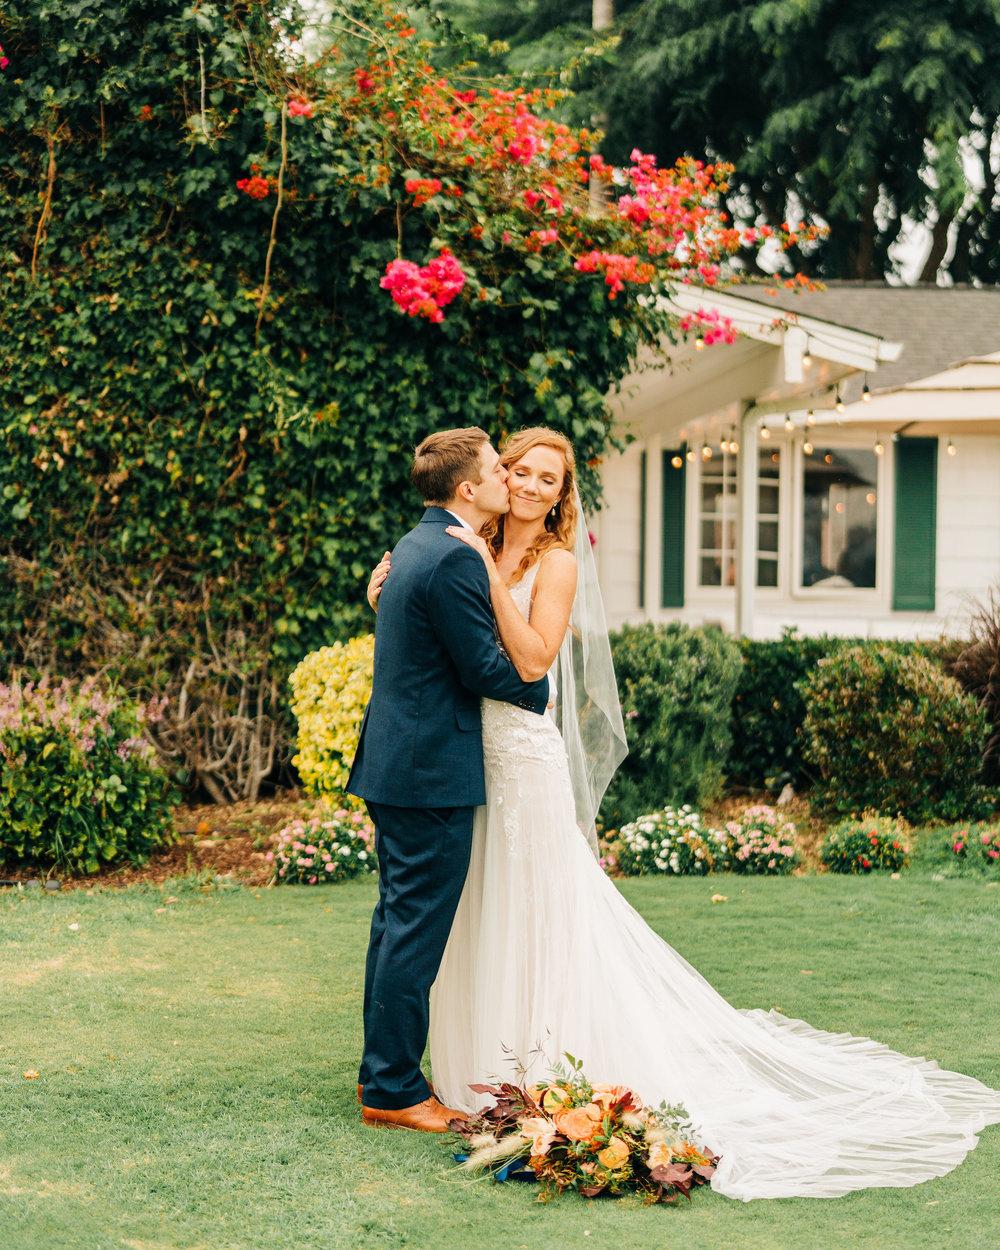 allie-shupe-tyler-wiggins-wedding-santa-barbara 125.jpg